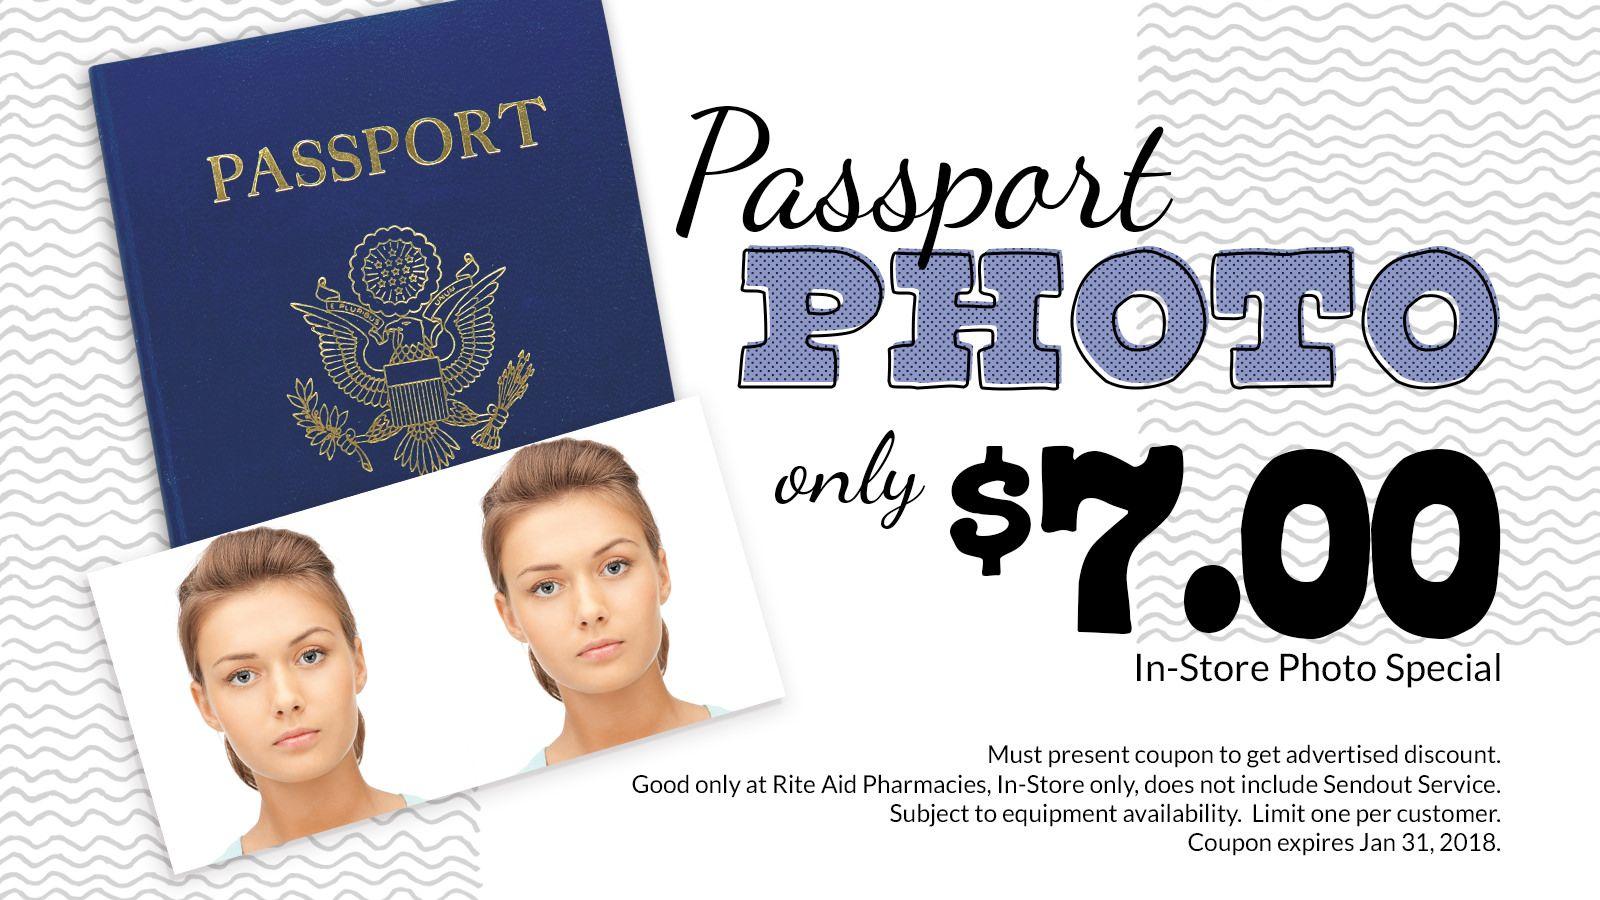 Photo Deals Advertising Image Online Savings Online Deals Deal